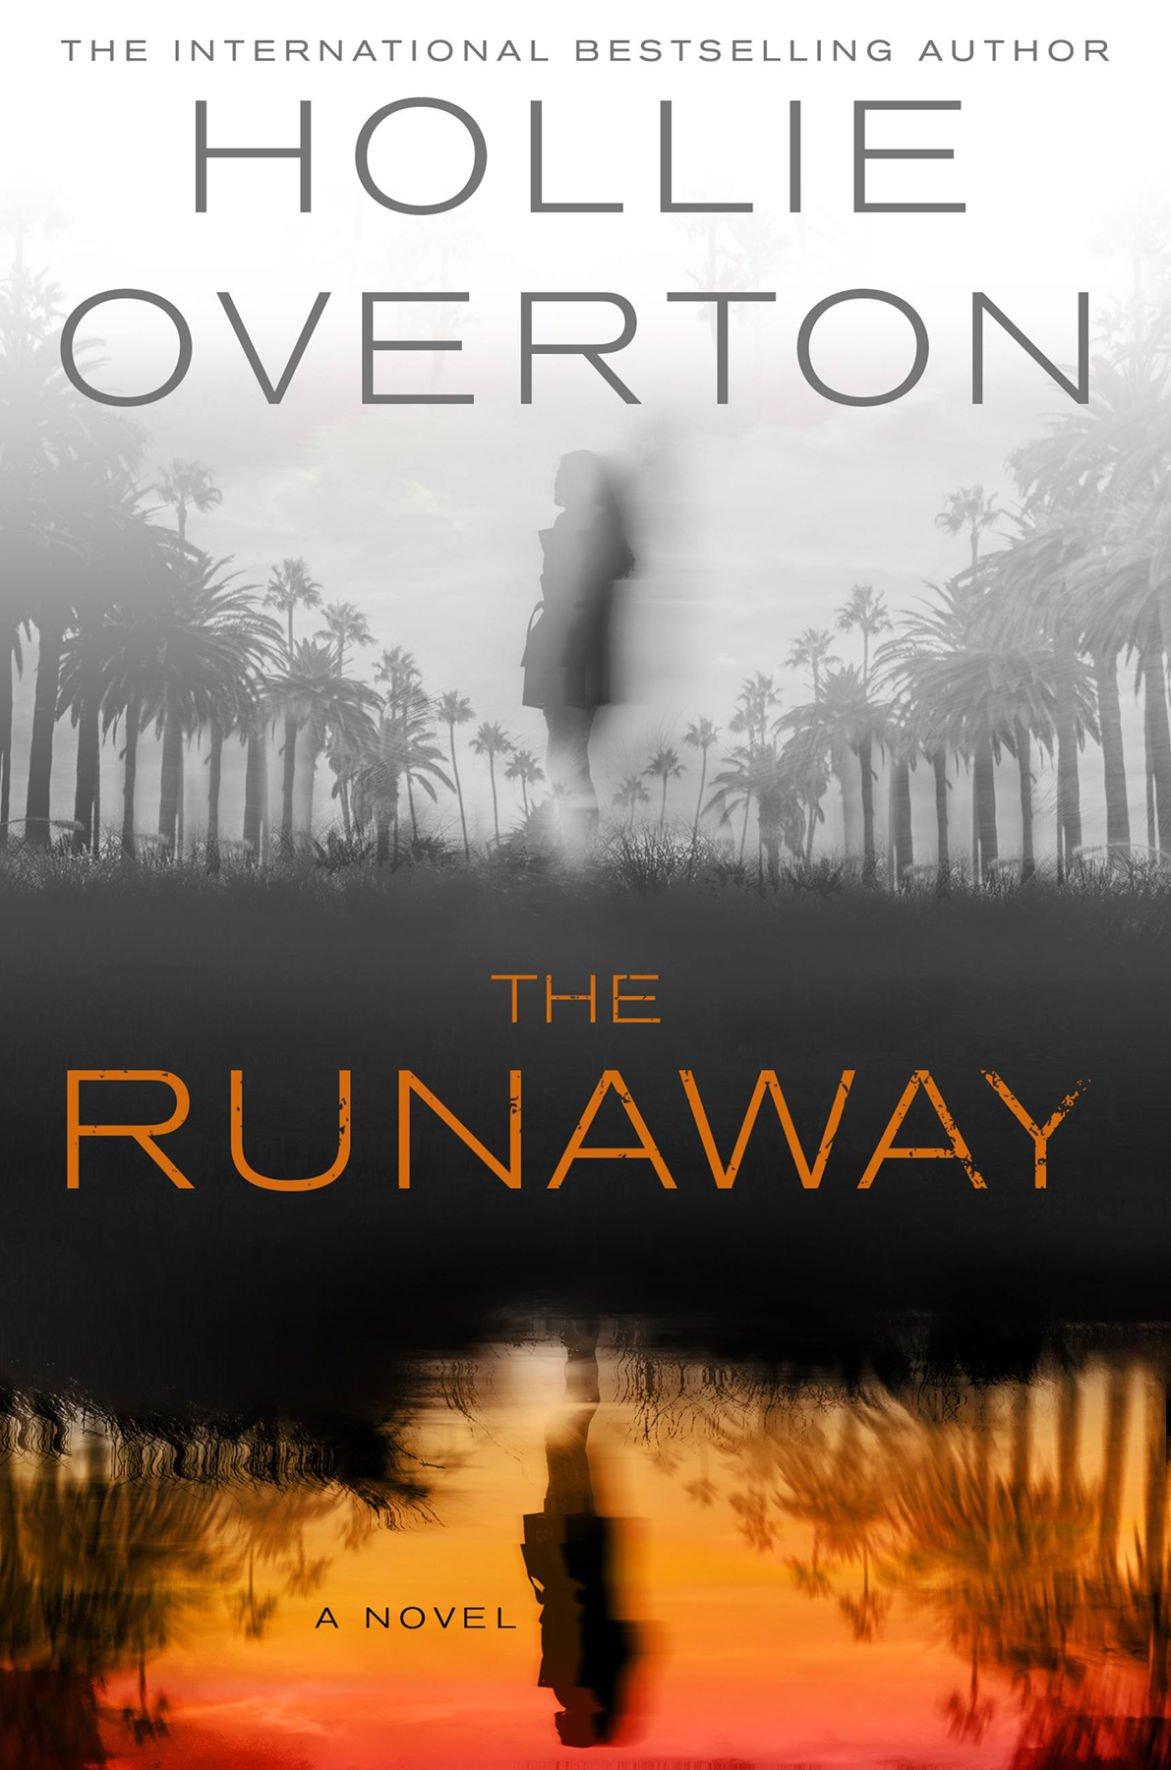 'The Runaway'